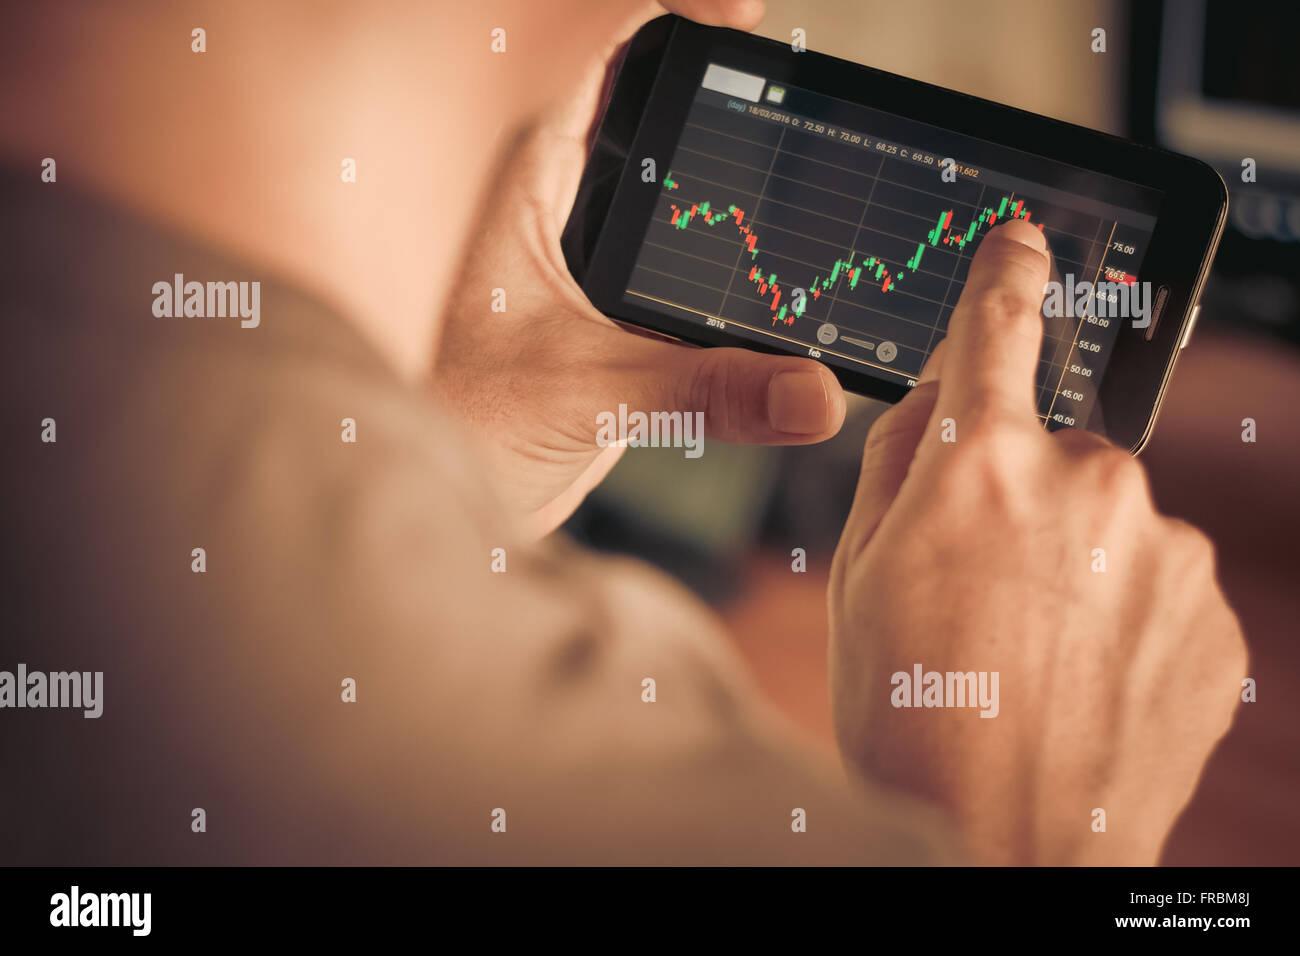 Un hombre control de stock market en smartphone Imagen De Stock